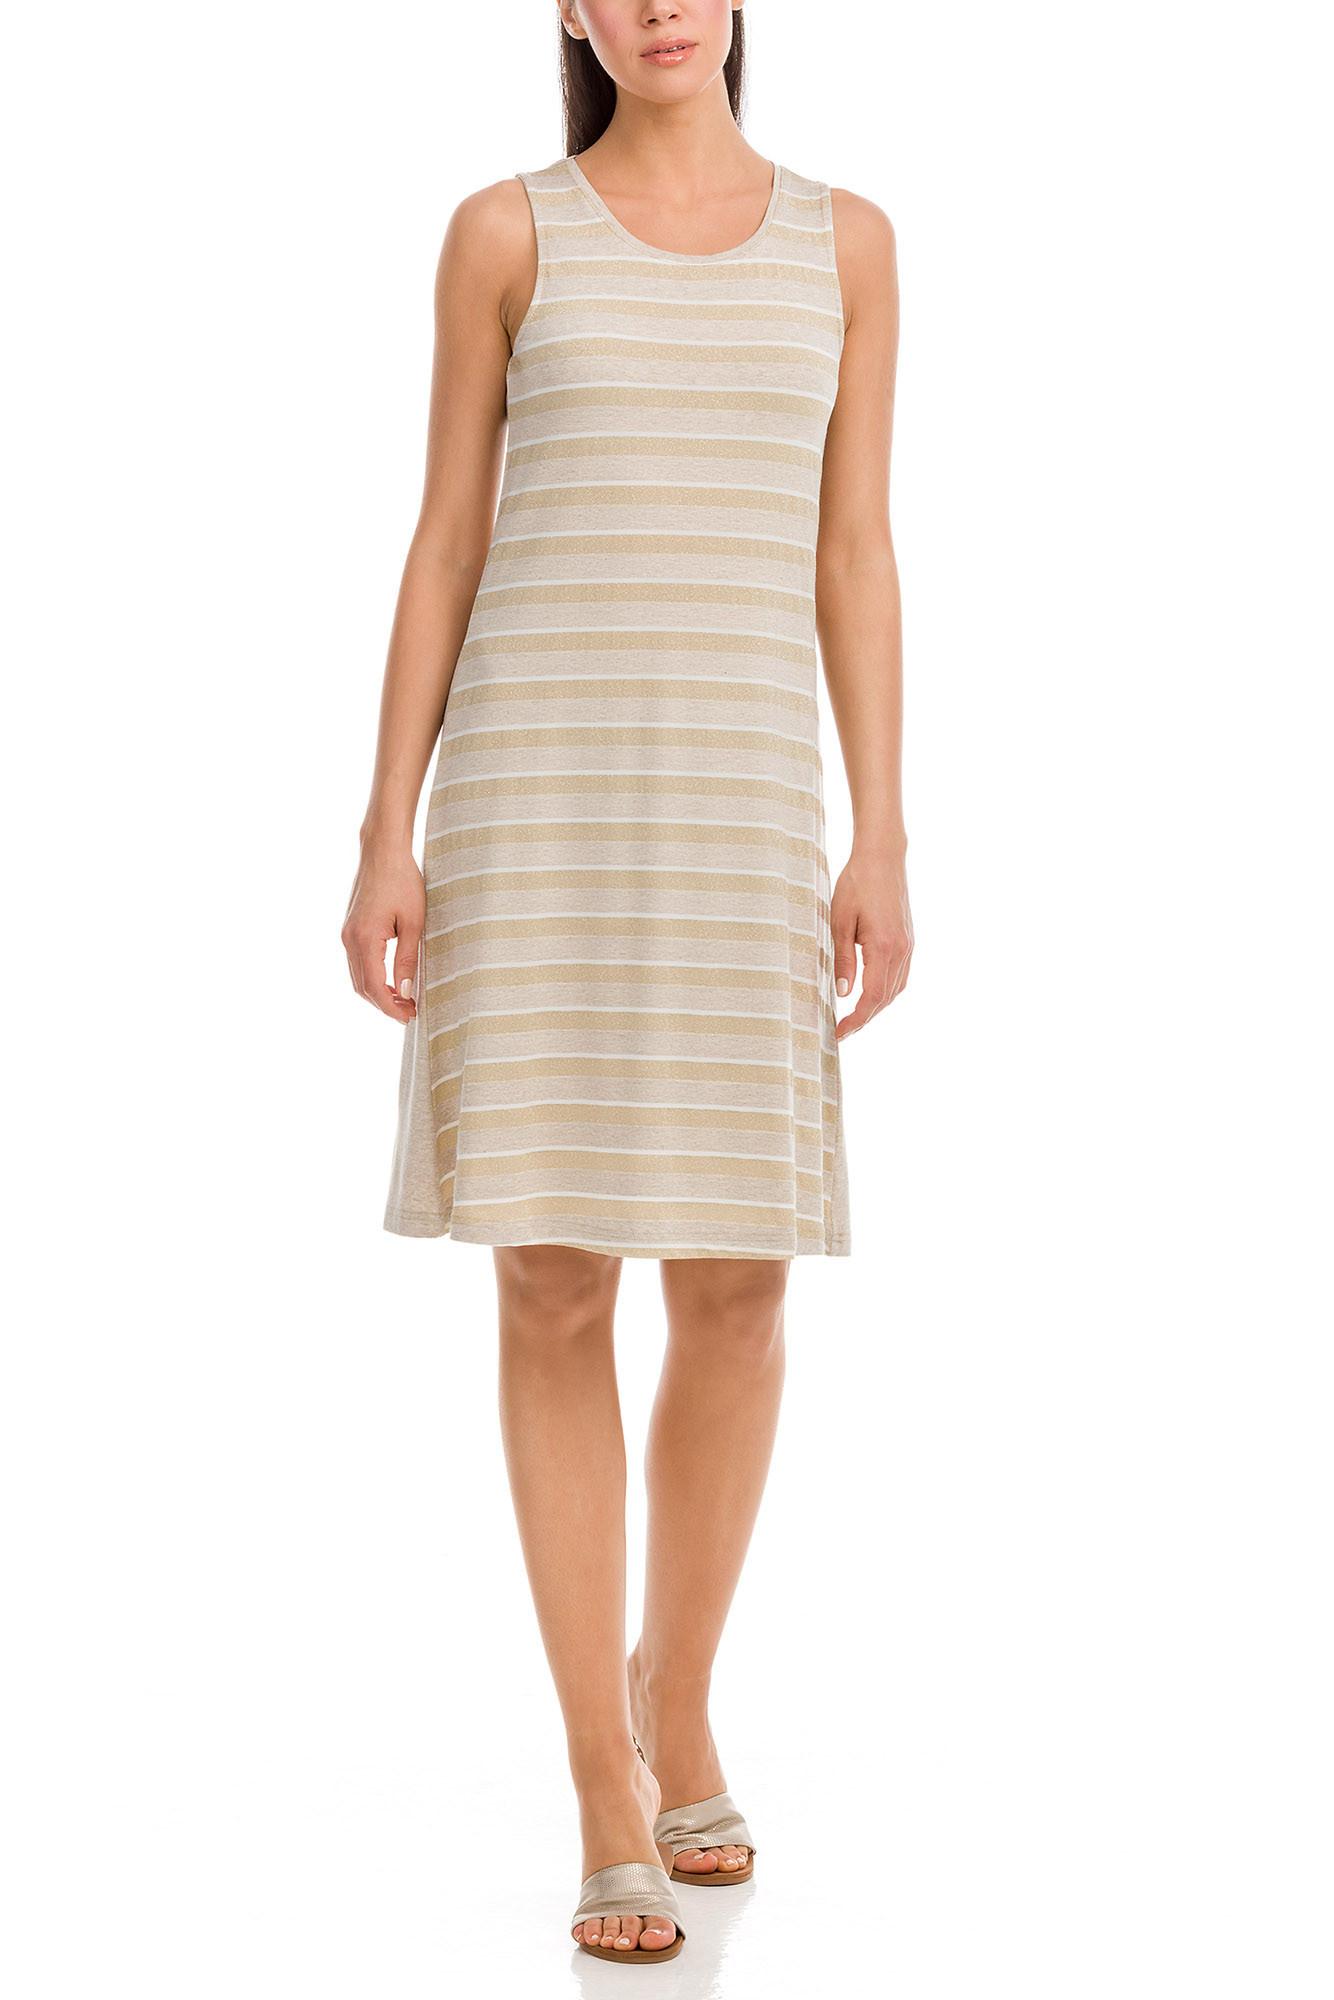 Vamp - Dámske šaty 12555 - Vamp beige melange xxl